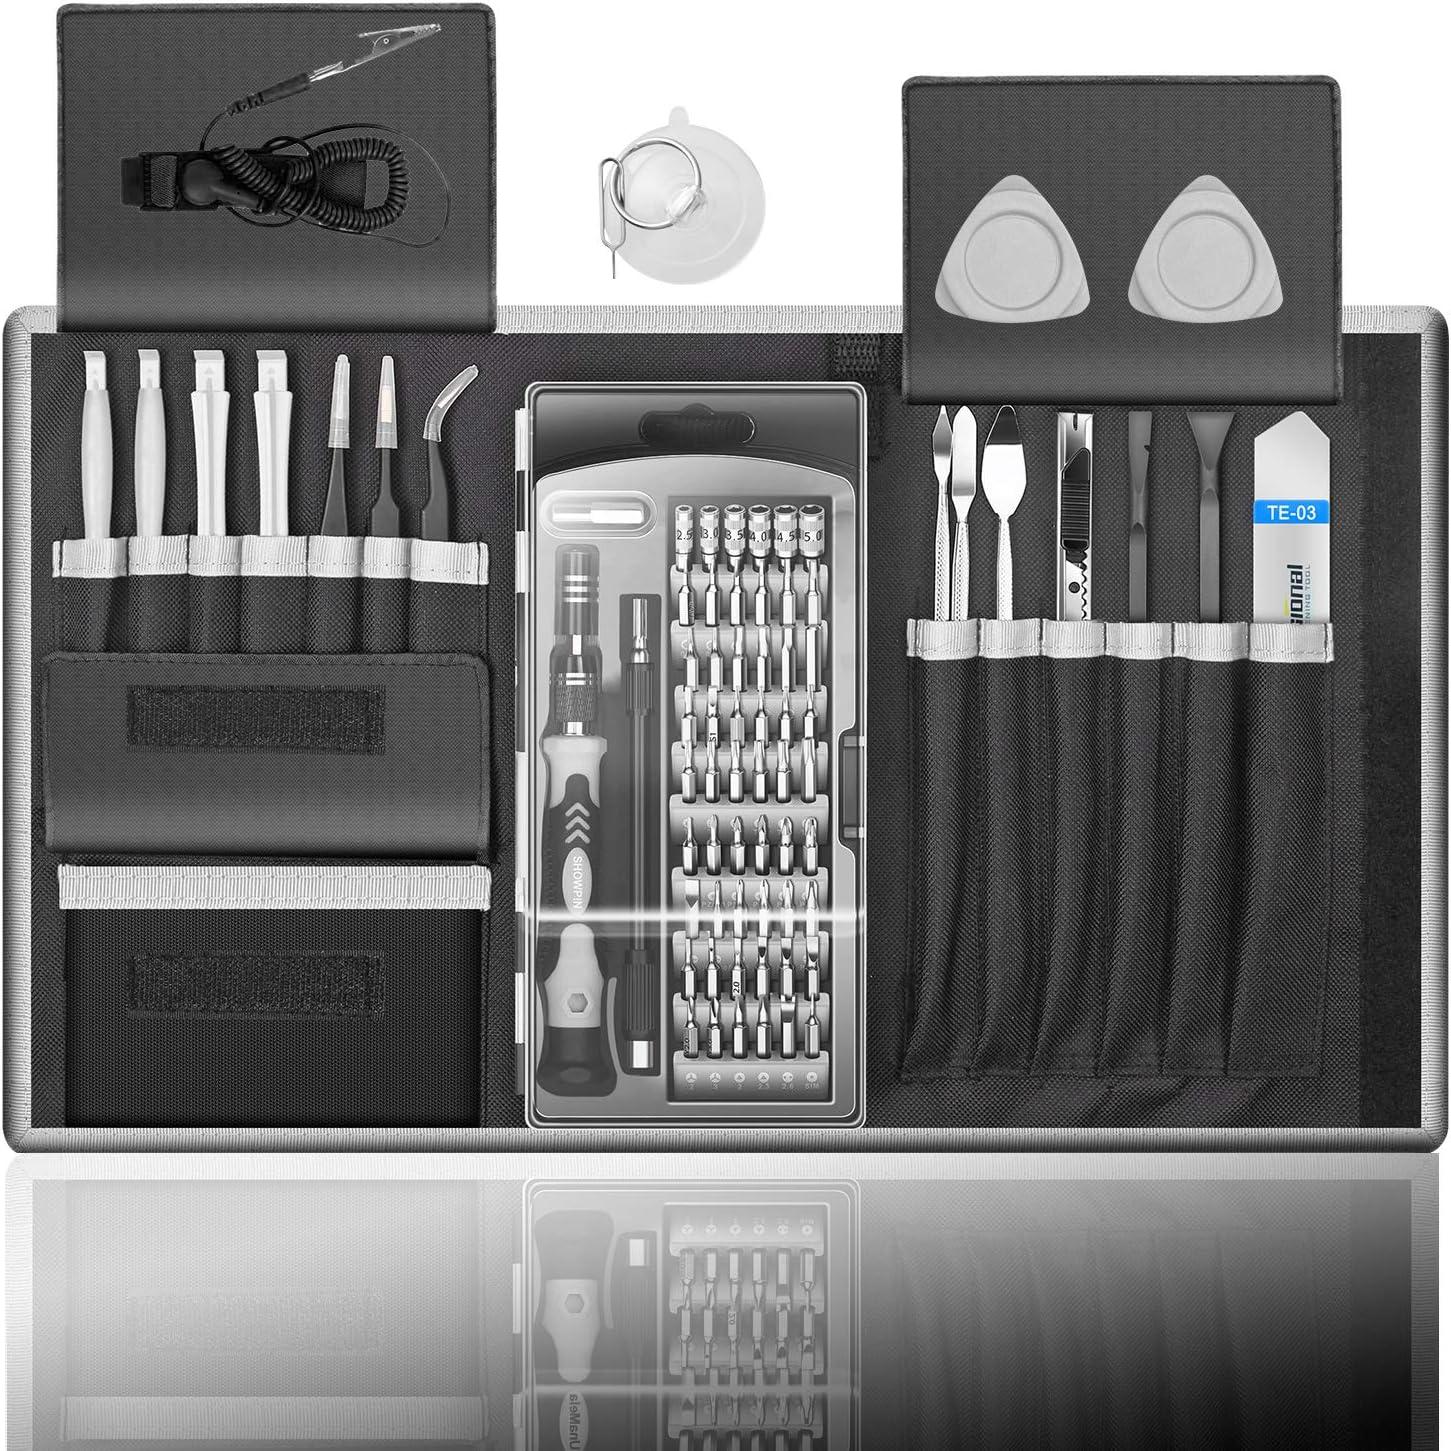 80 in 1 Professional Computer Repair Tool Kit, Precision Laptop Screwdriver Set, with 56 Bit, Anti-Static Wrist and 24 Repair Tools, Suitable for MacBook, PC, Tablet, PS4, Xbox Controller Repair…